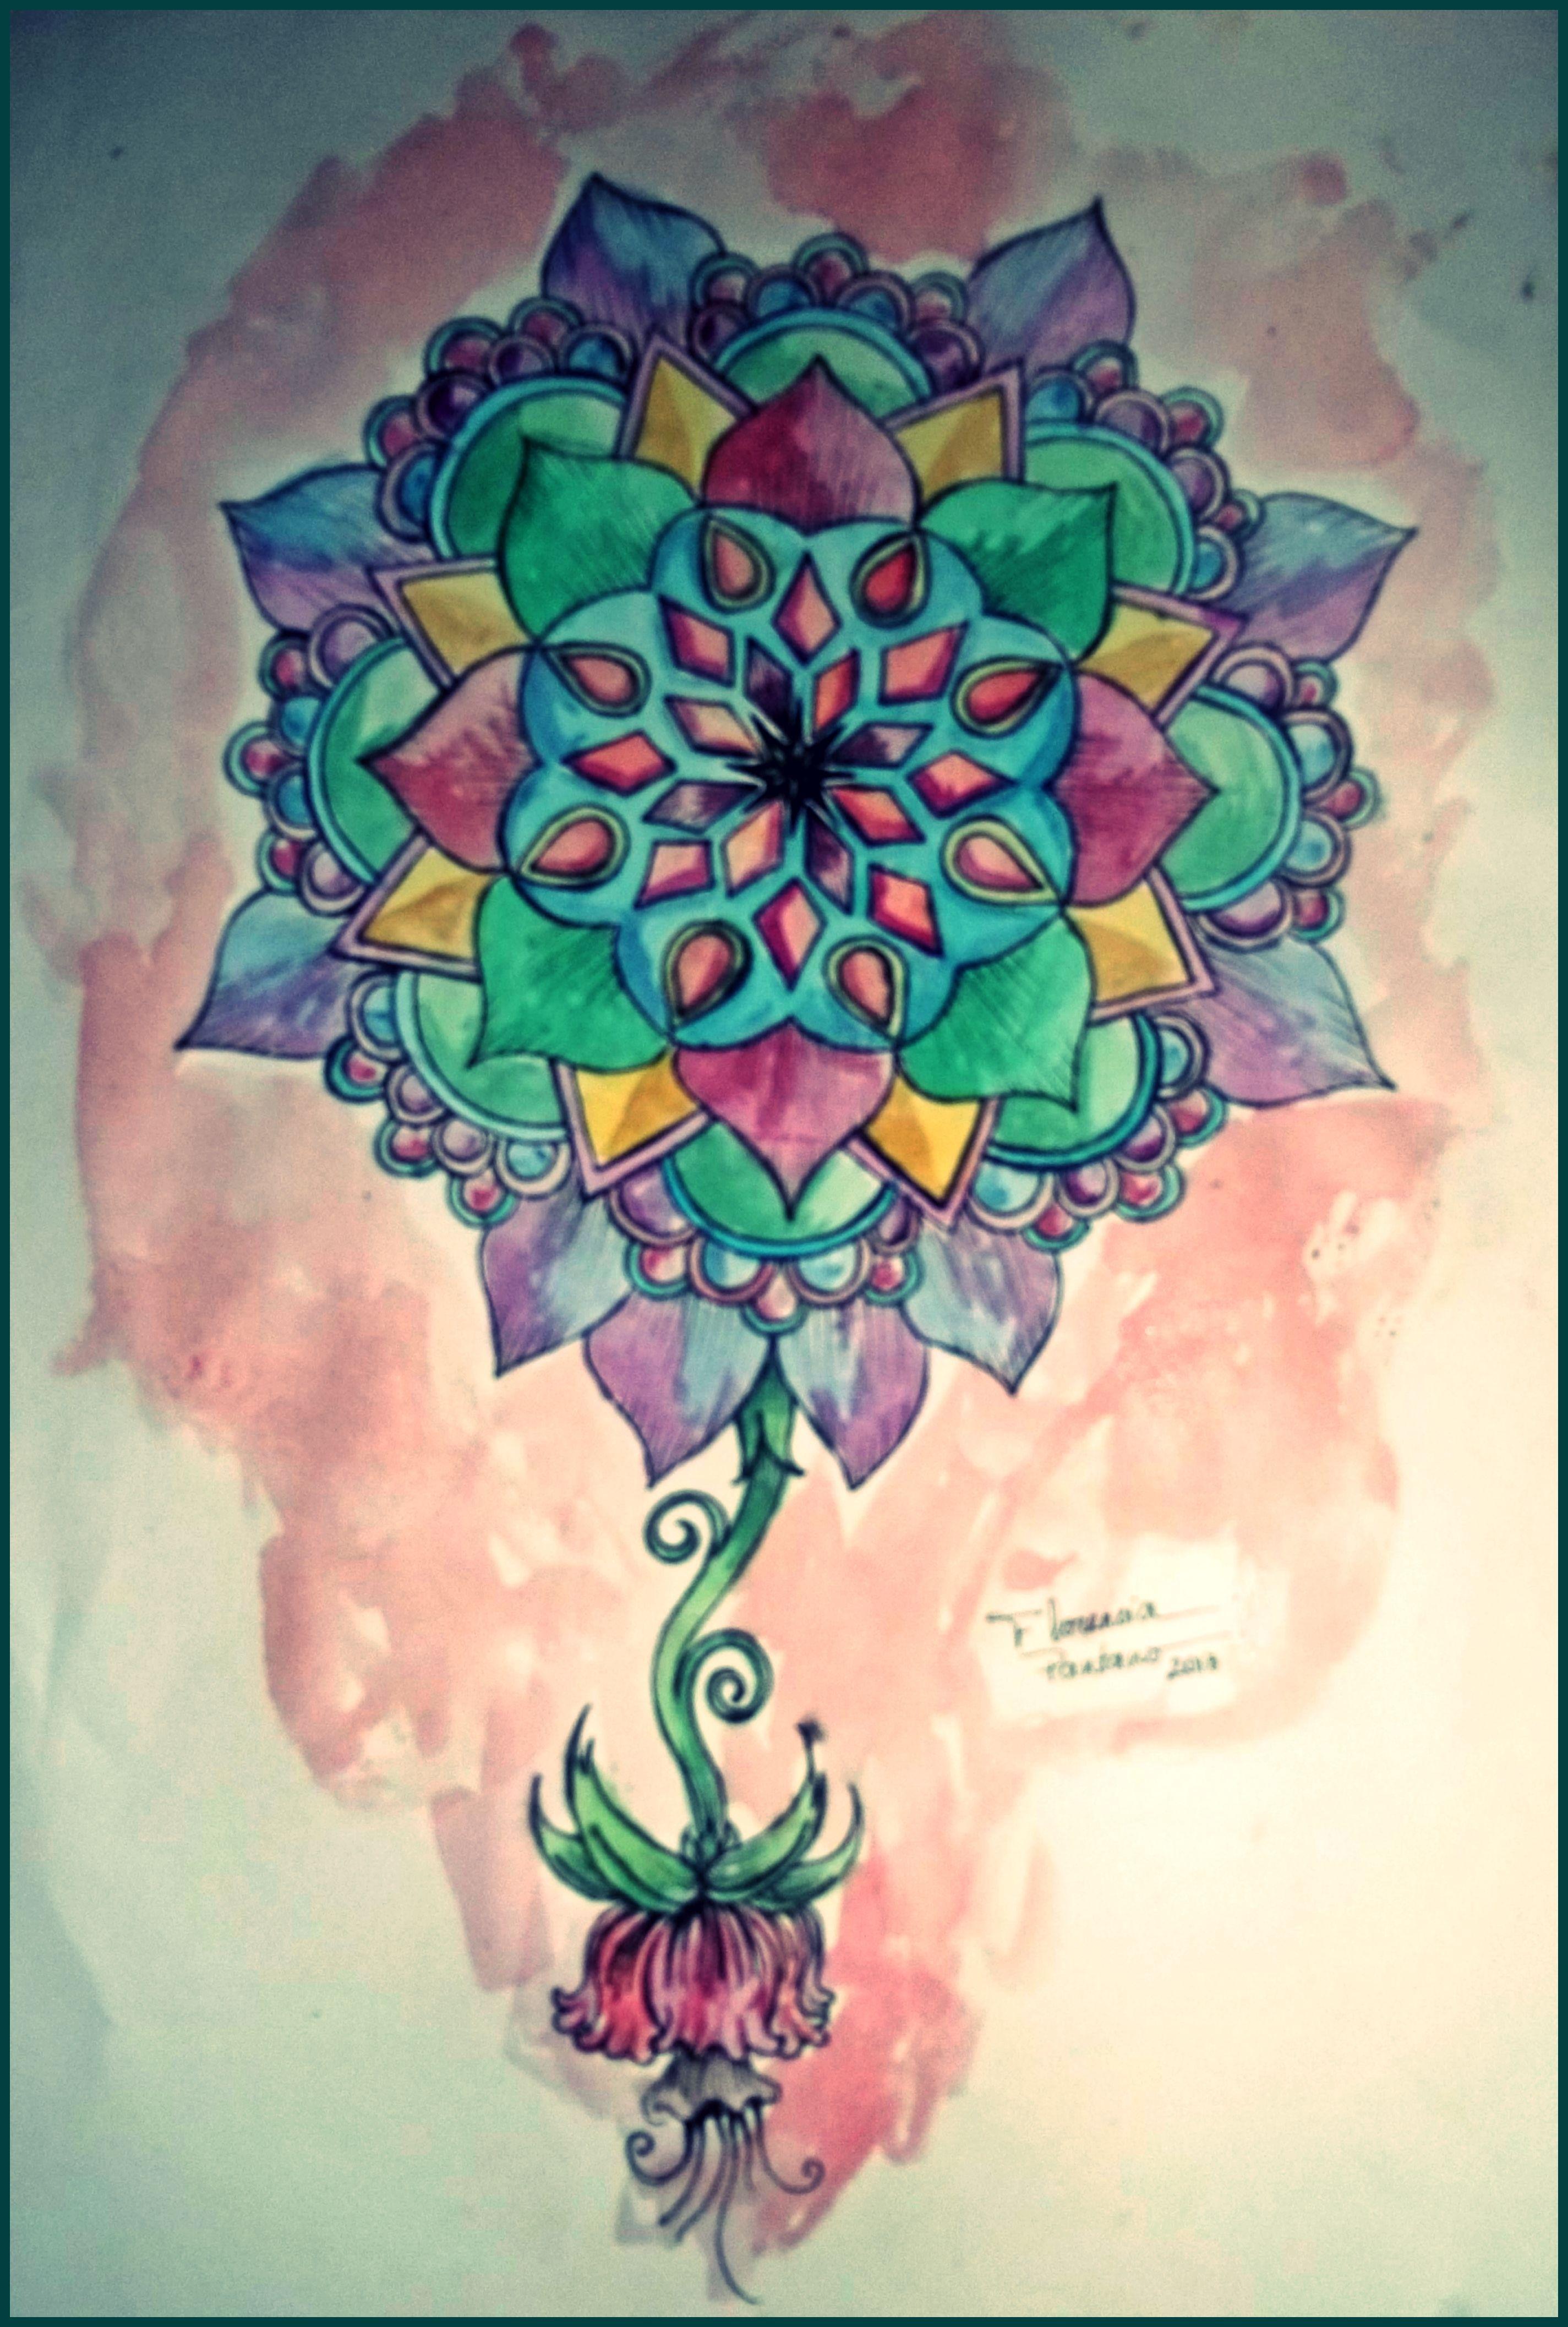 Watercolor - Aquarela Mandala para uma tattoo Florencia Pantano